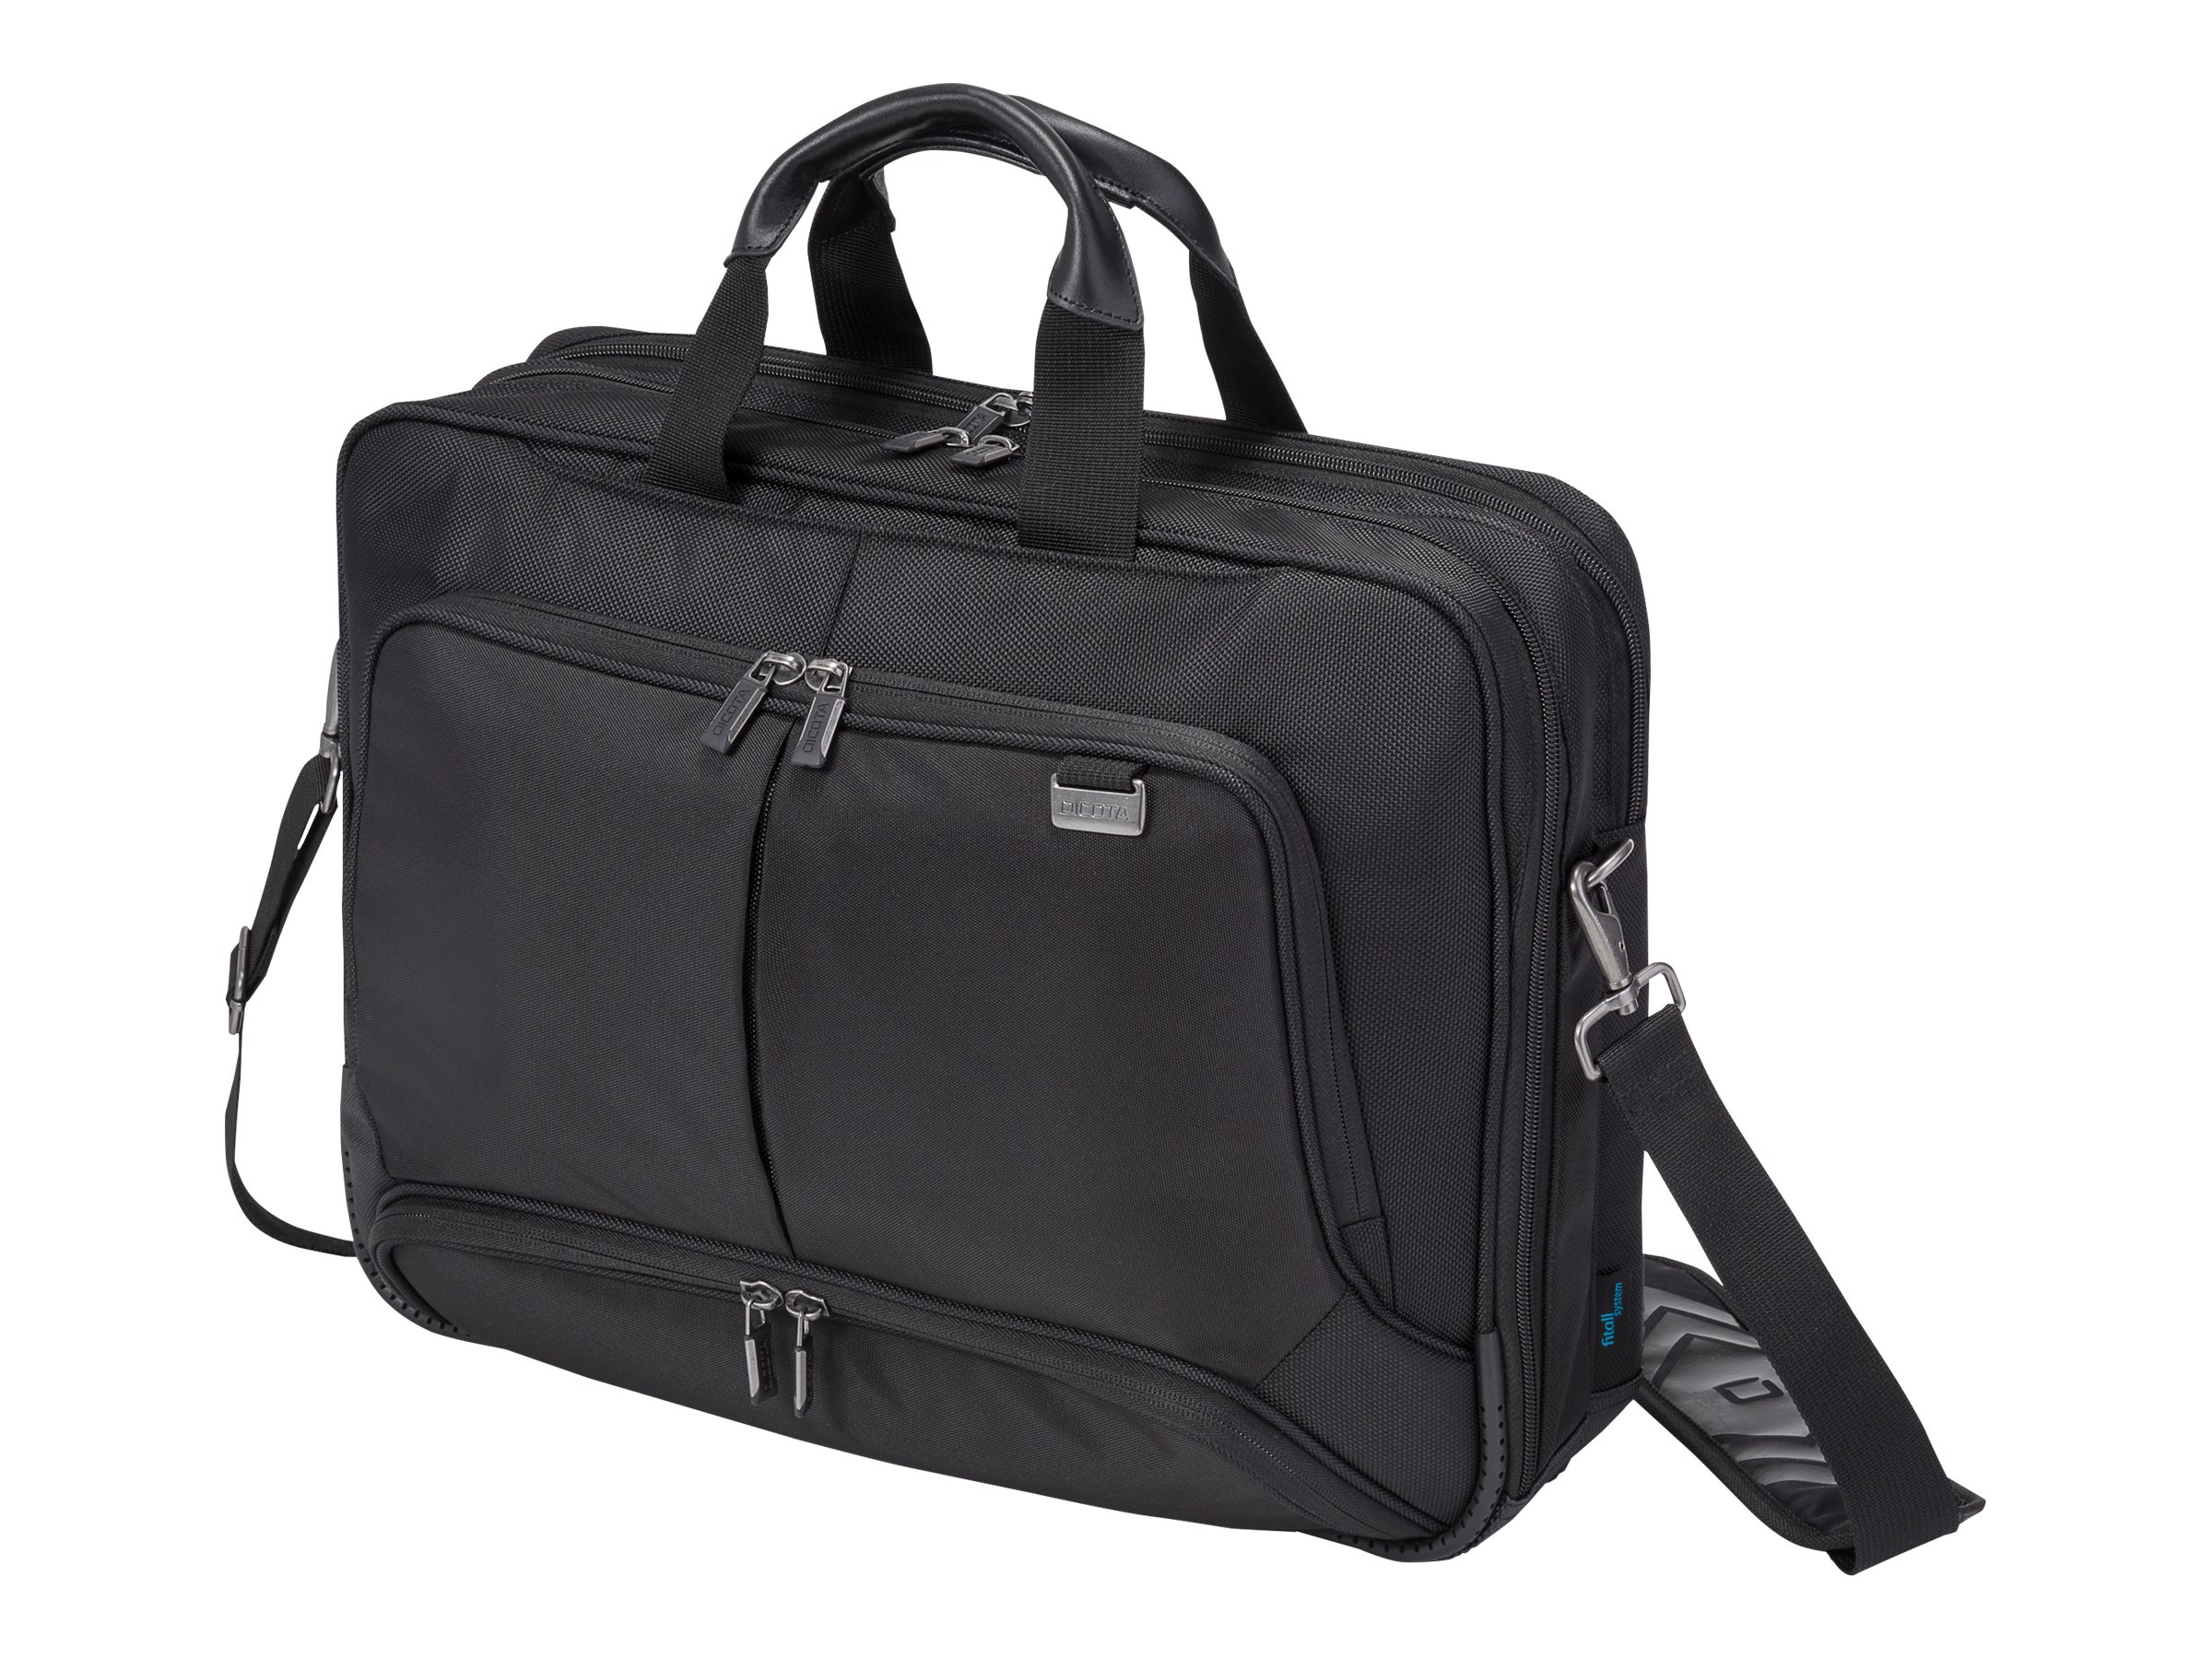 DICOTA Top Traveller PRO Laptop Bag 14.1